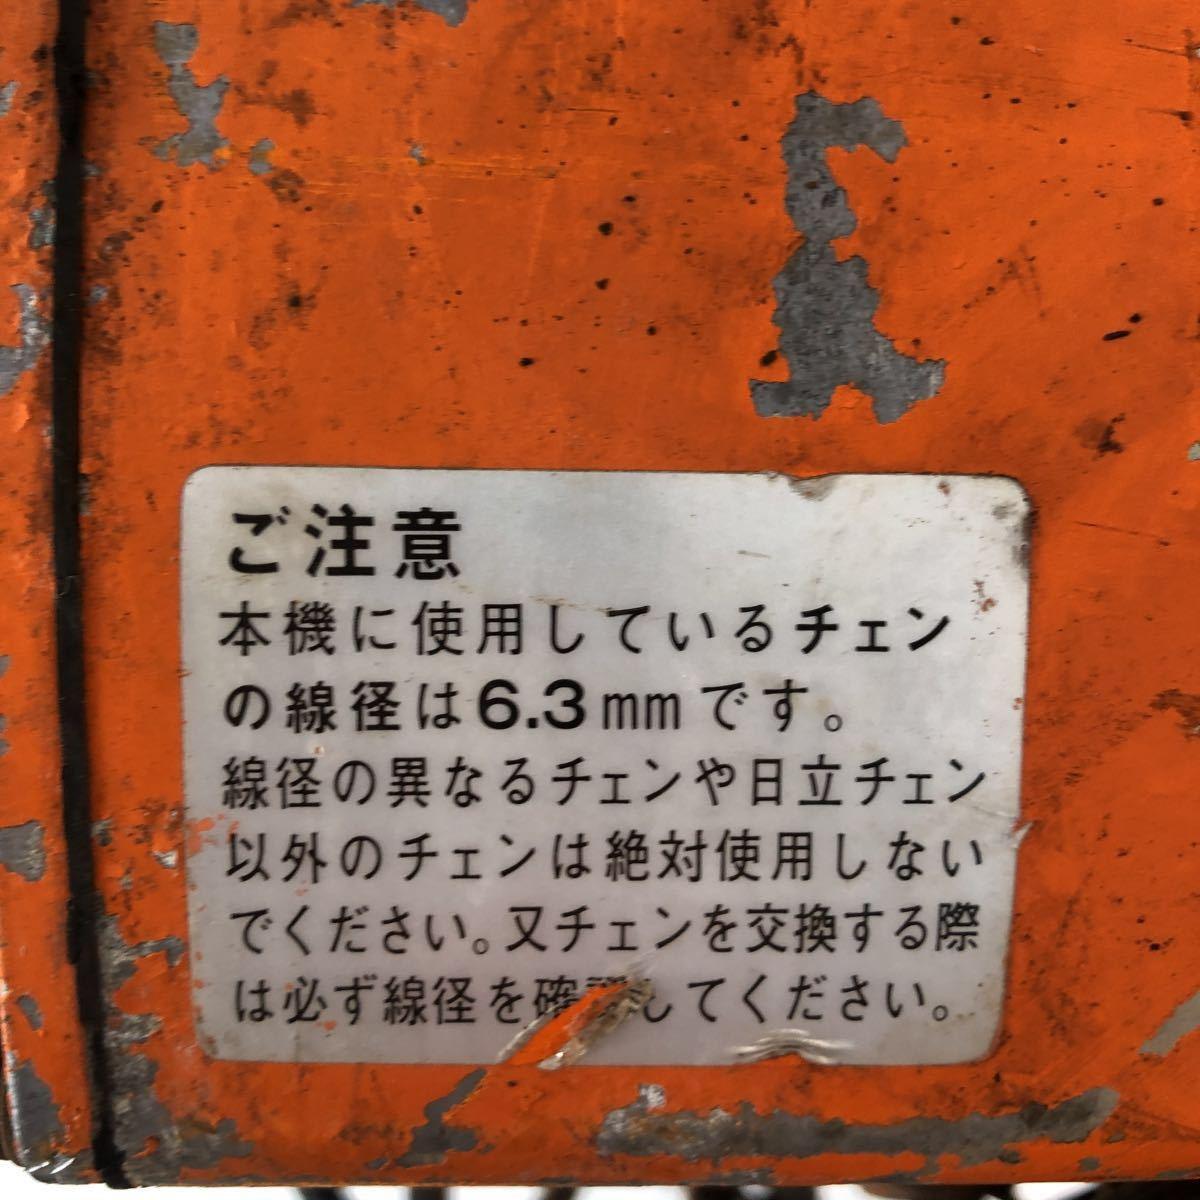 HITACHI 電動チェーンブロック ホイスト 1/4SS2 250kg 動作確認済み 八王子市より出品 引取りも歓迎 1円スタート_画像6